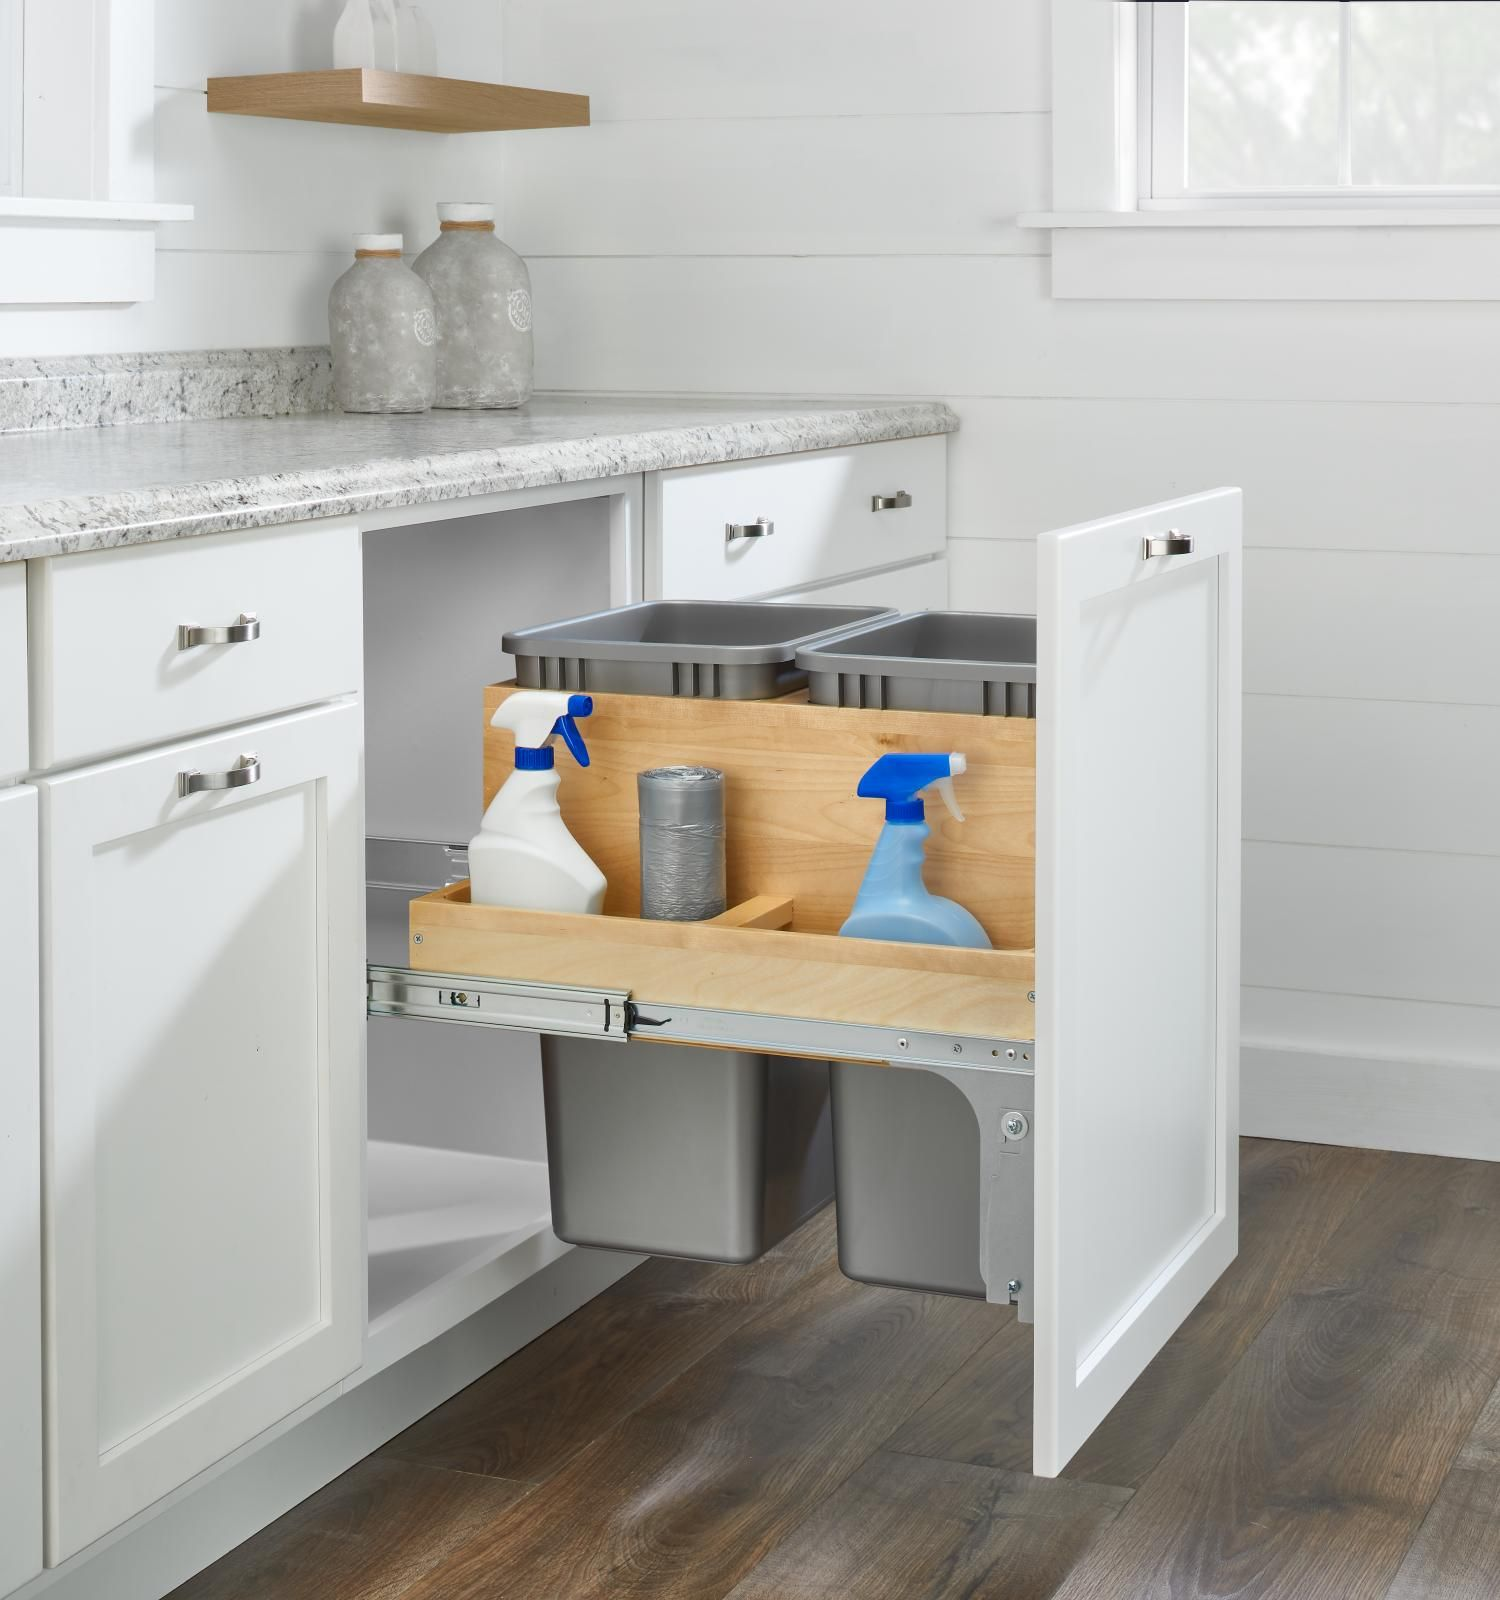 Rev A Shelf 4wctm Wood Drawer Box Trash Pull Out In 2020 Face Frame Cabinets Shelves Rev A Shelf